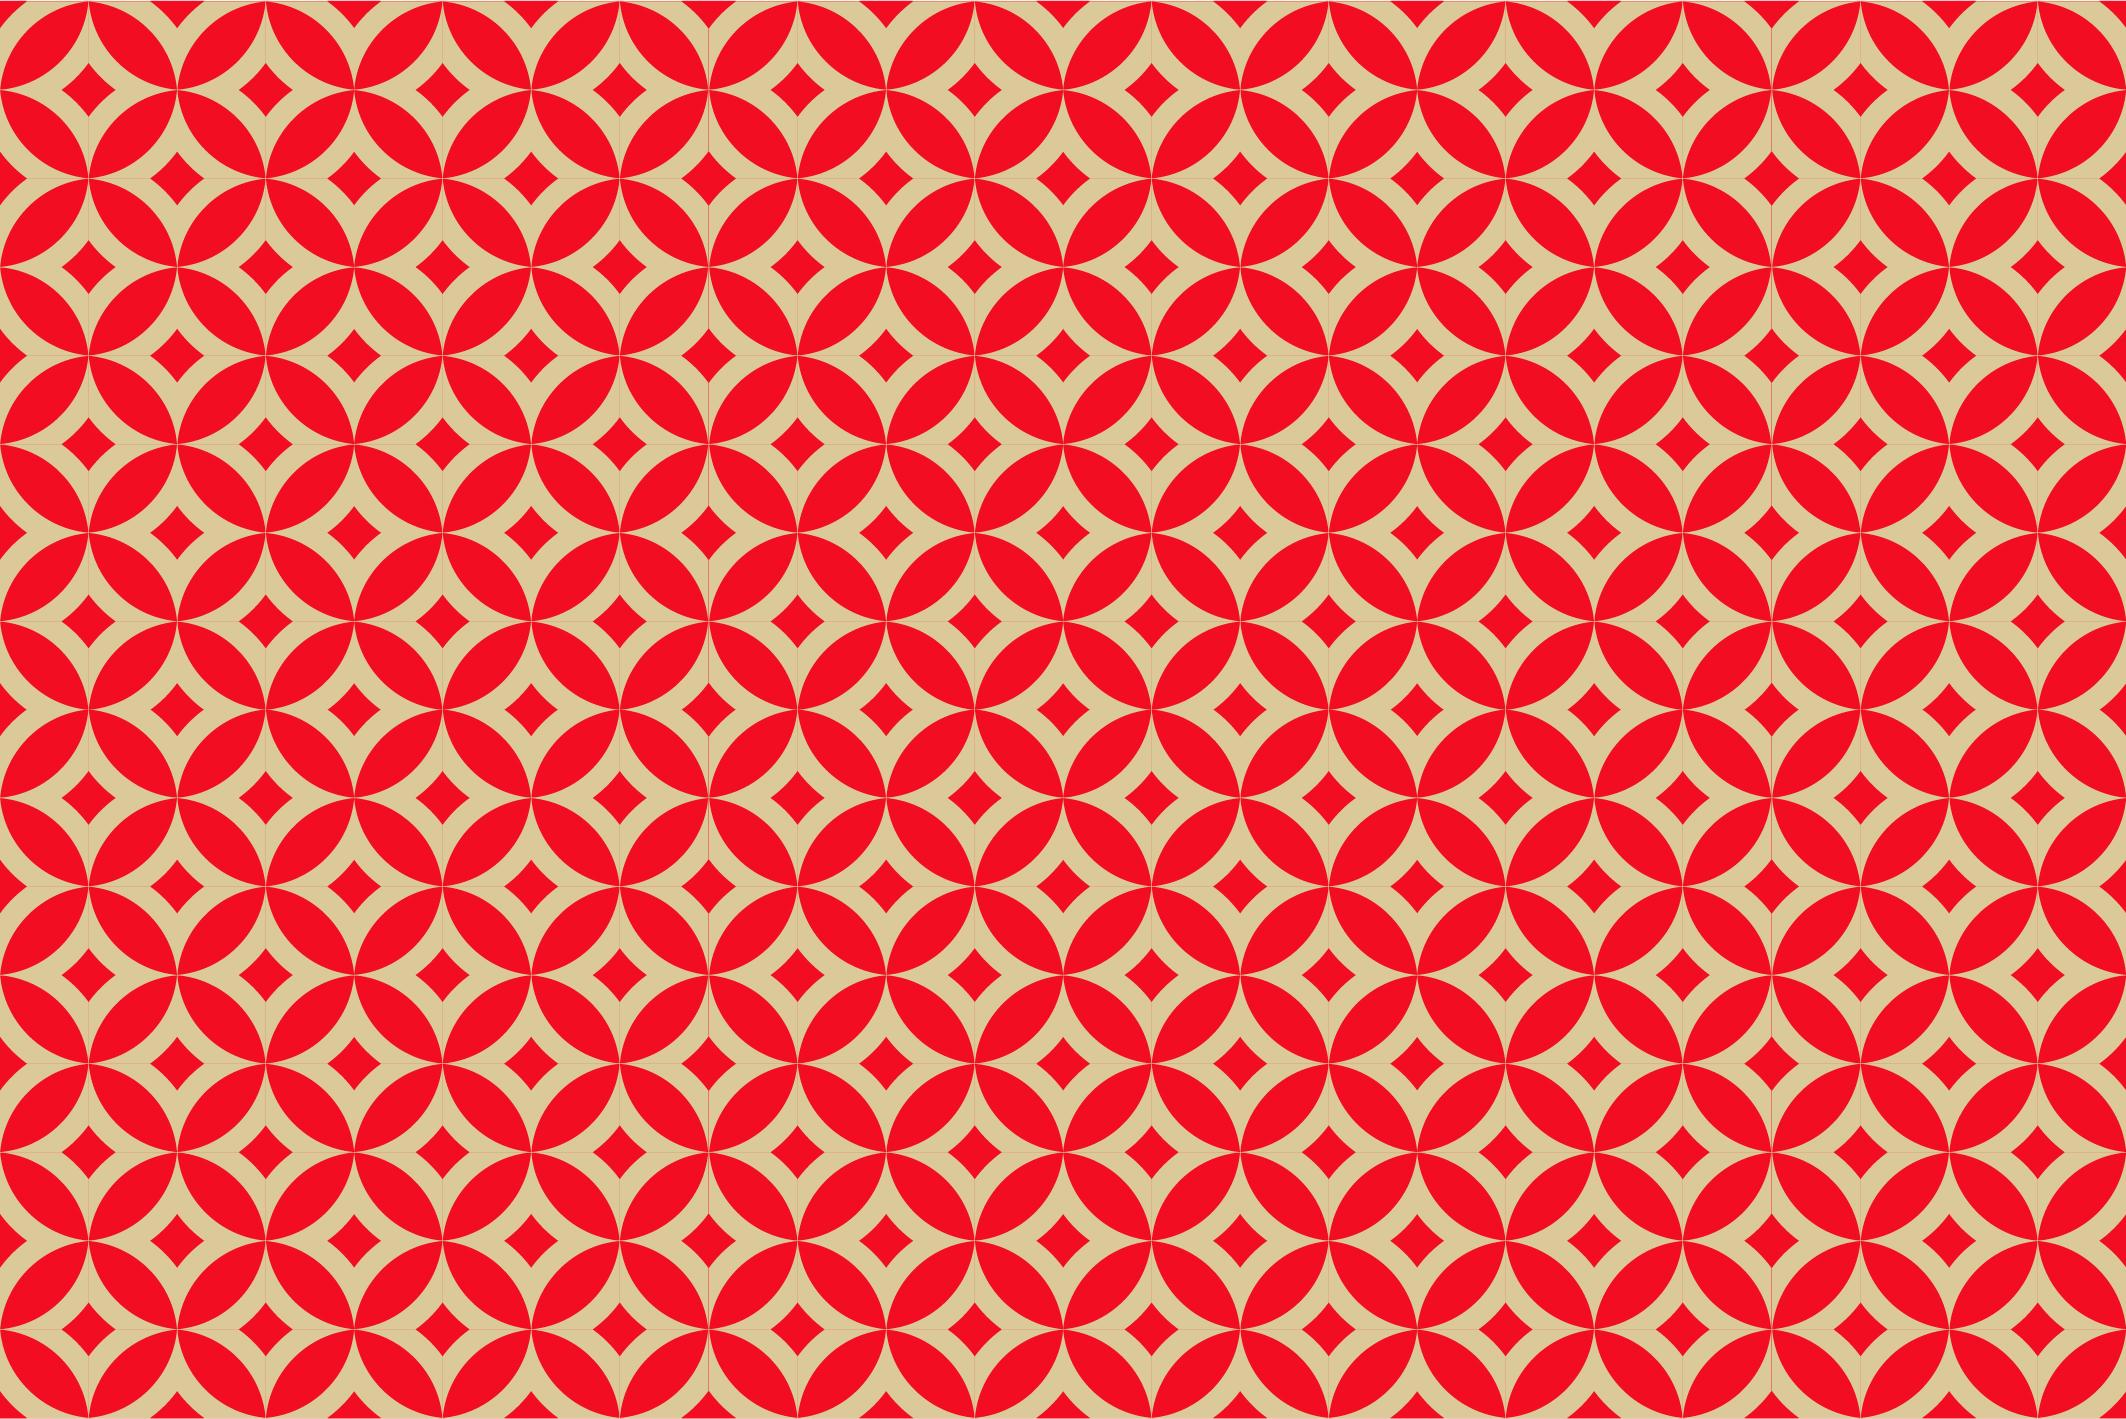 Luxury ornamental seamless patterns. example image 6